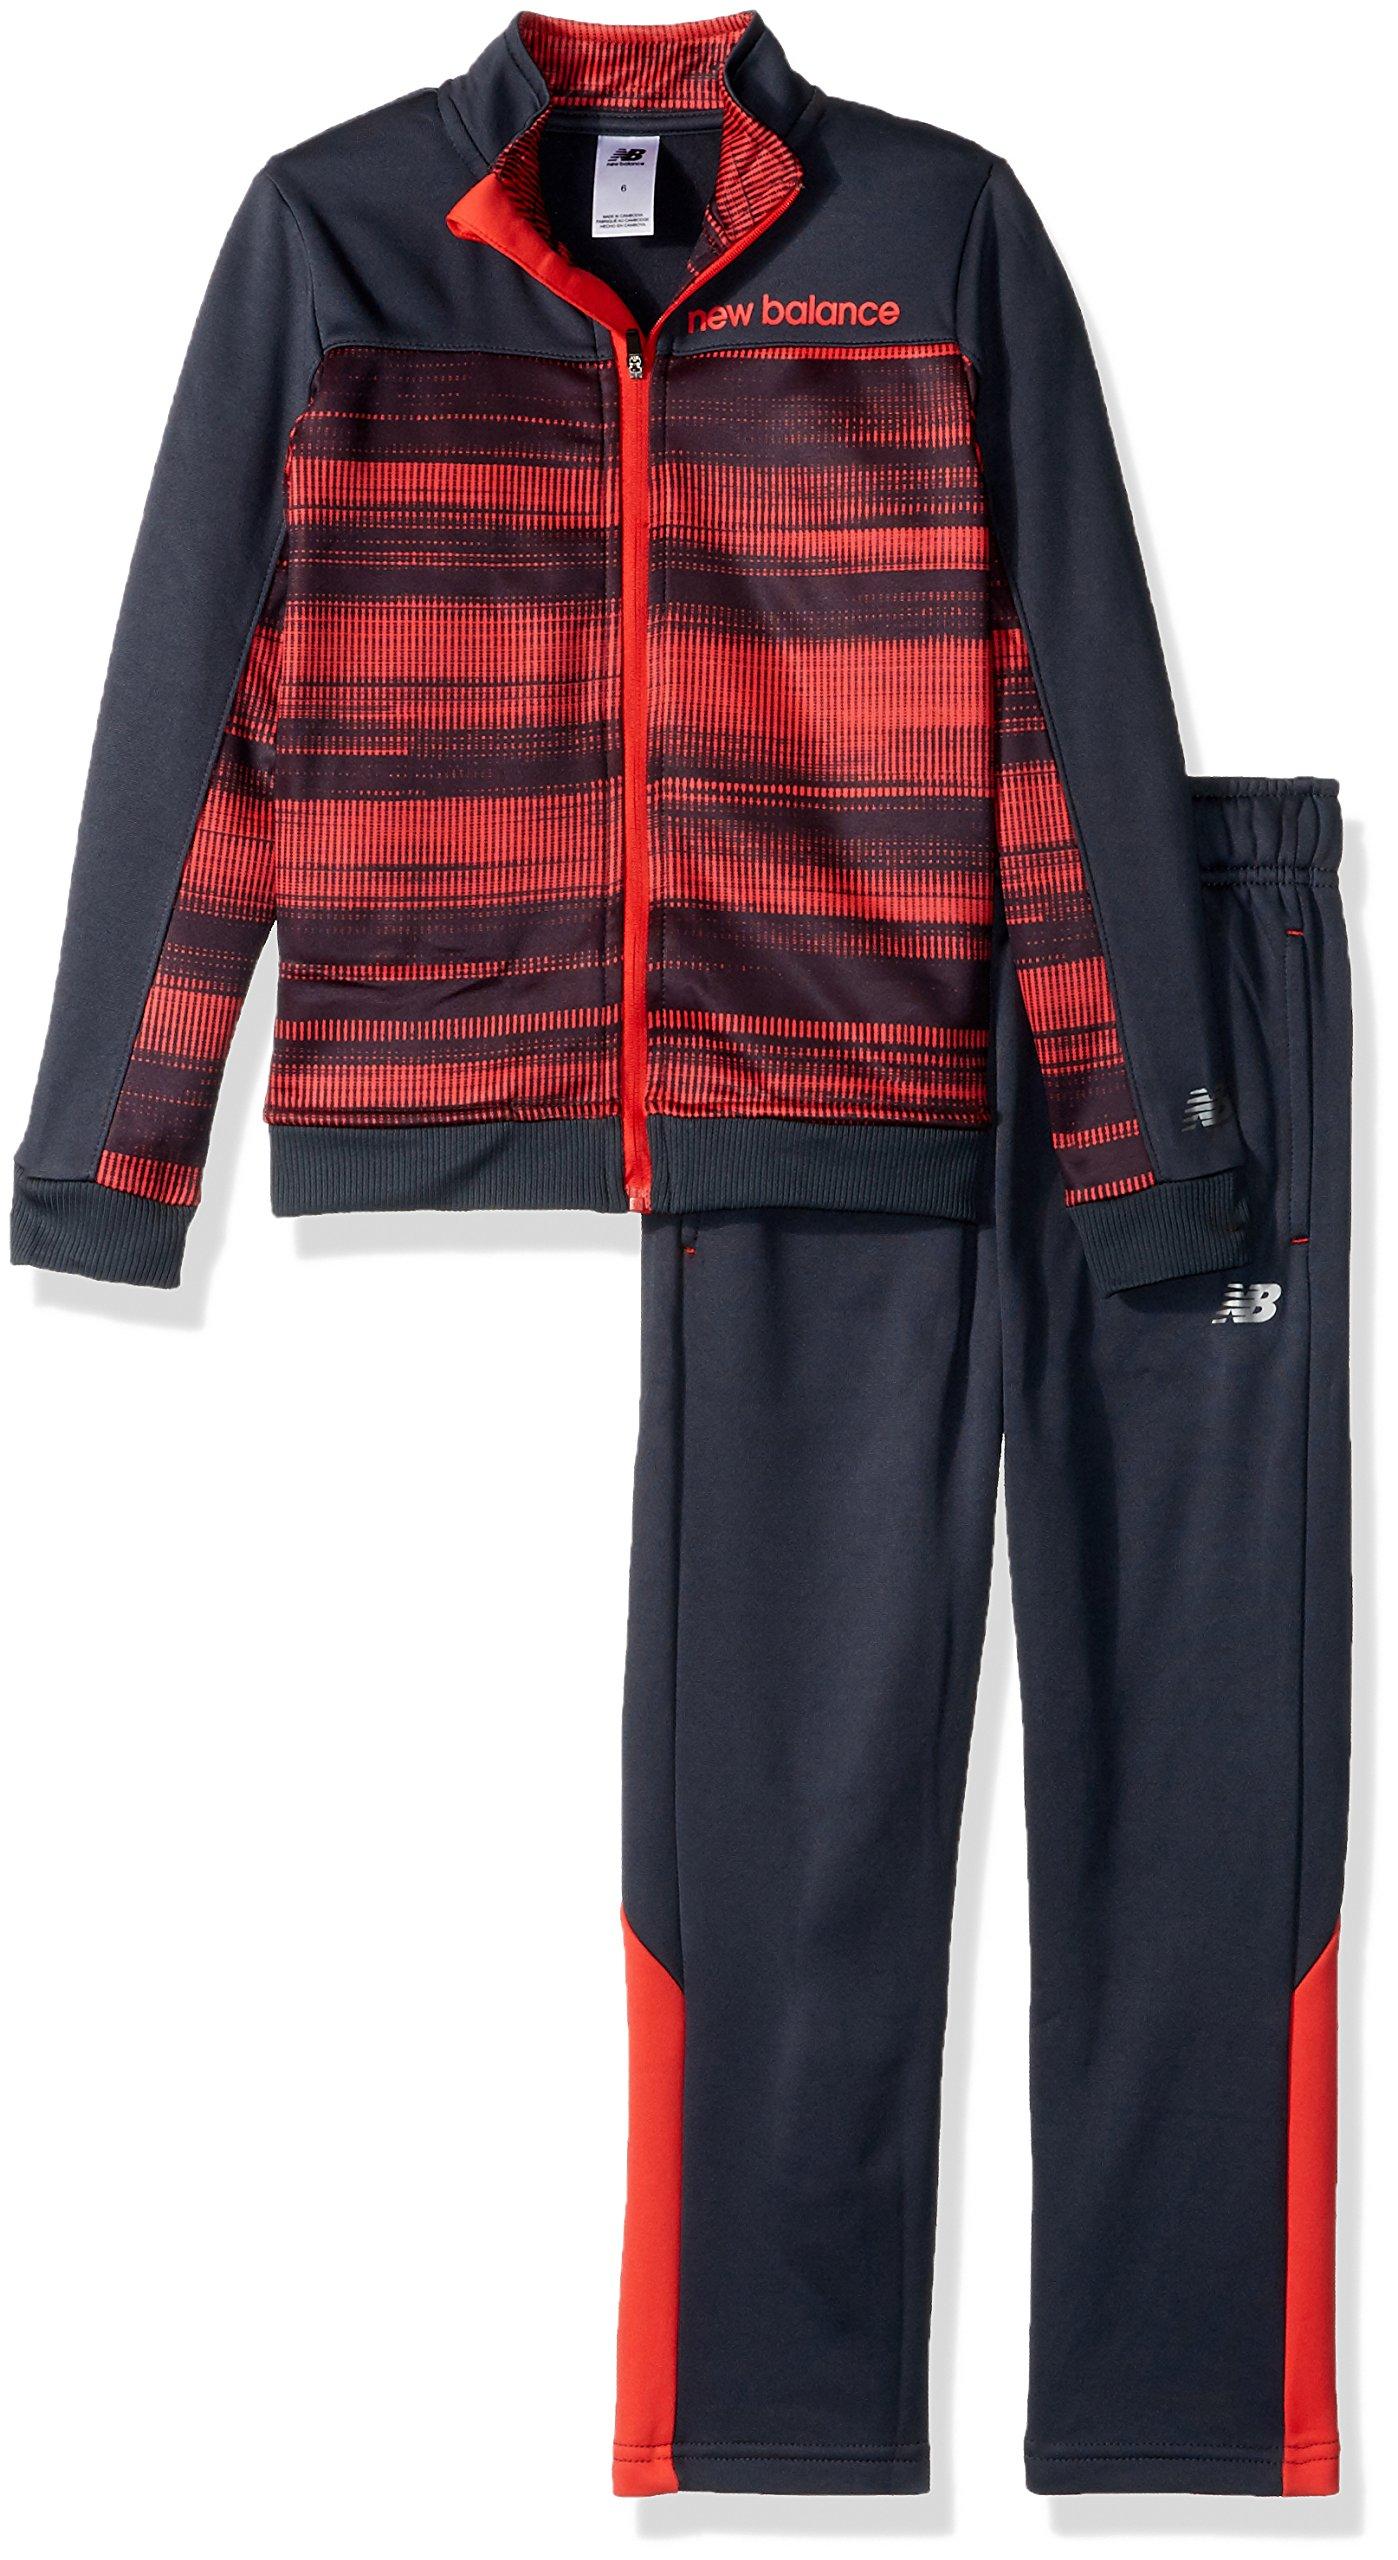 New Balance Toddler Boys' Athletic Jacket and Pant Set, Stripe/Thunder/Red, 3T by New Balance